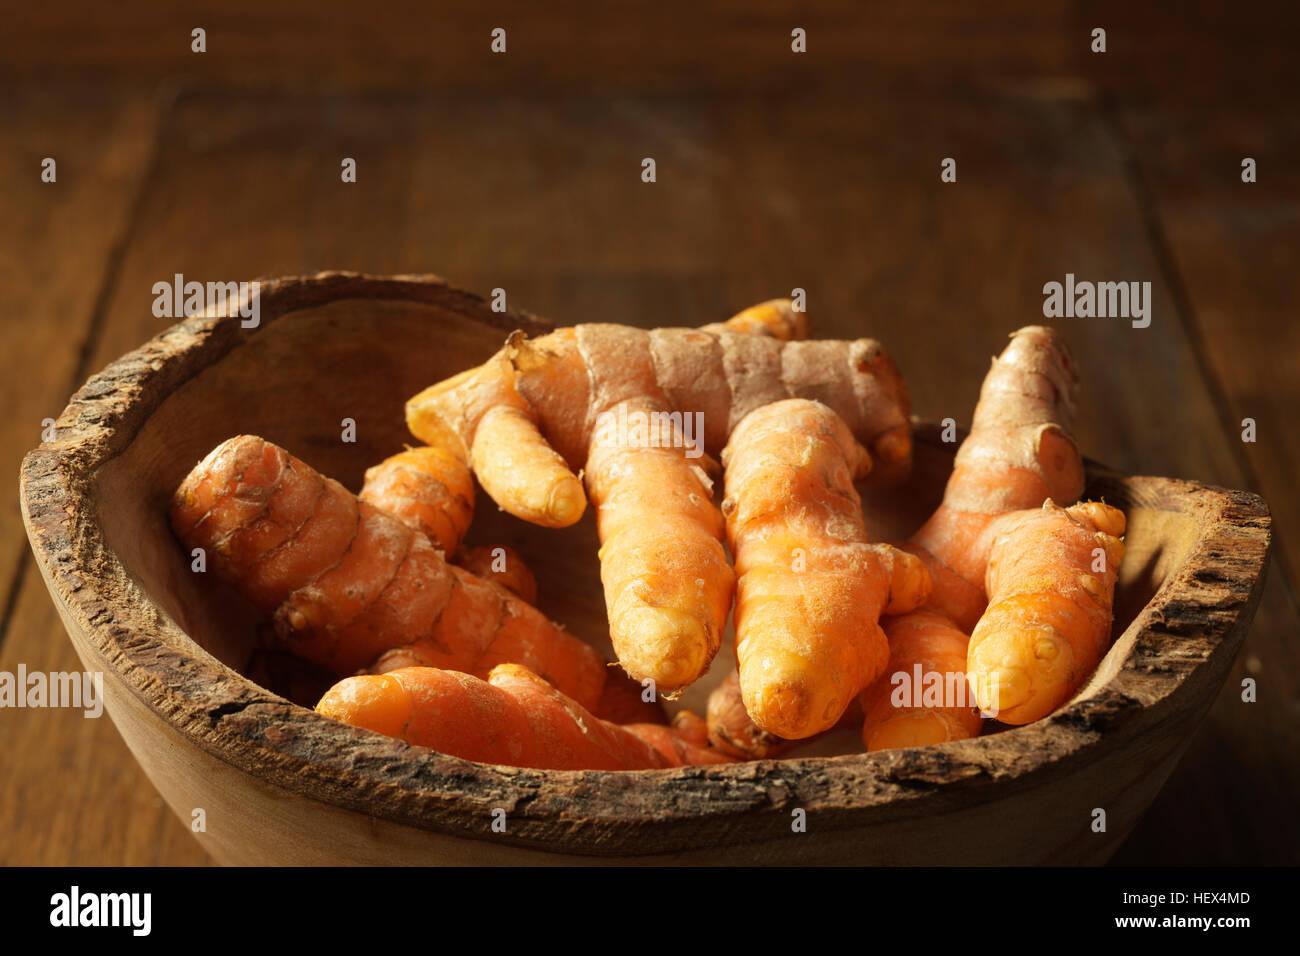 Fresh turmeric root - Stock Image